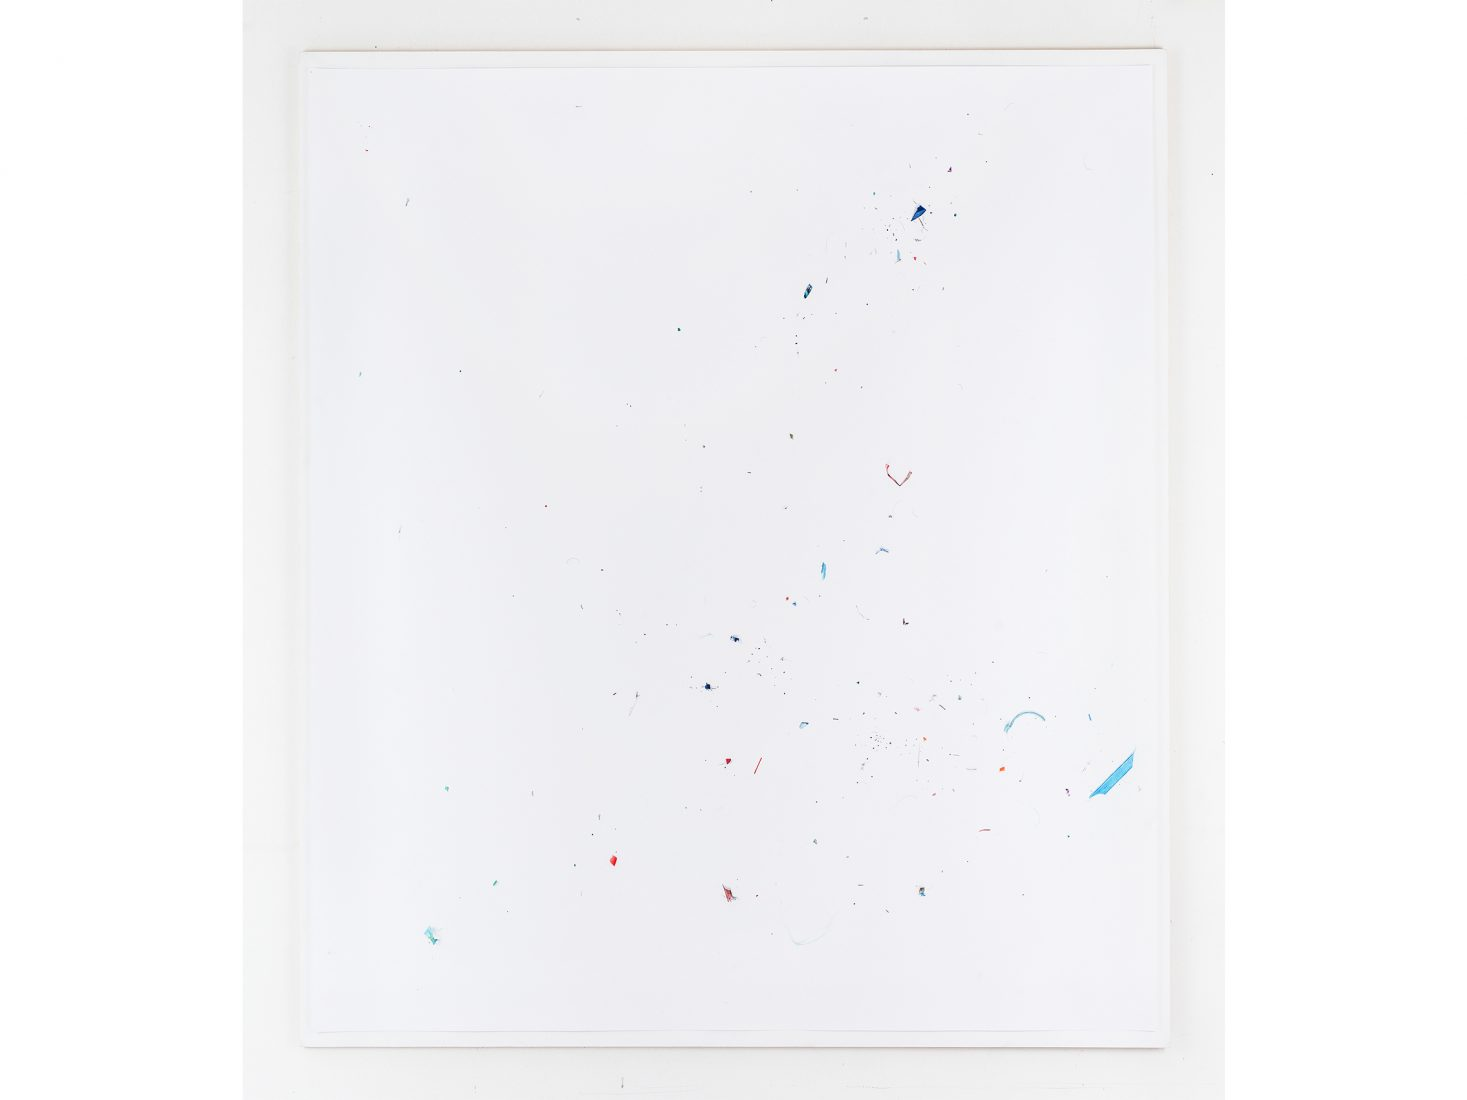 Michail Michailov. Dust to Dust#107, 2020, coloured pencil on paper, 138x138 cm